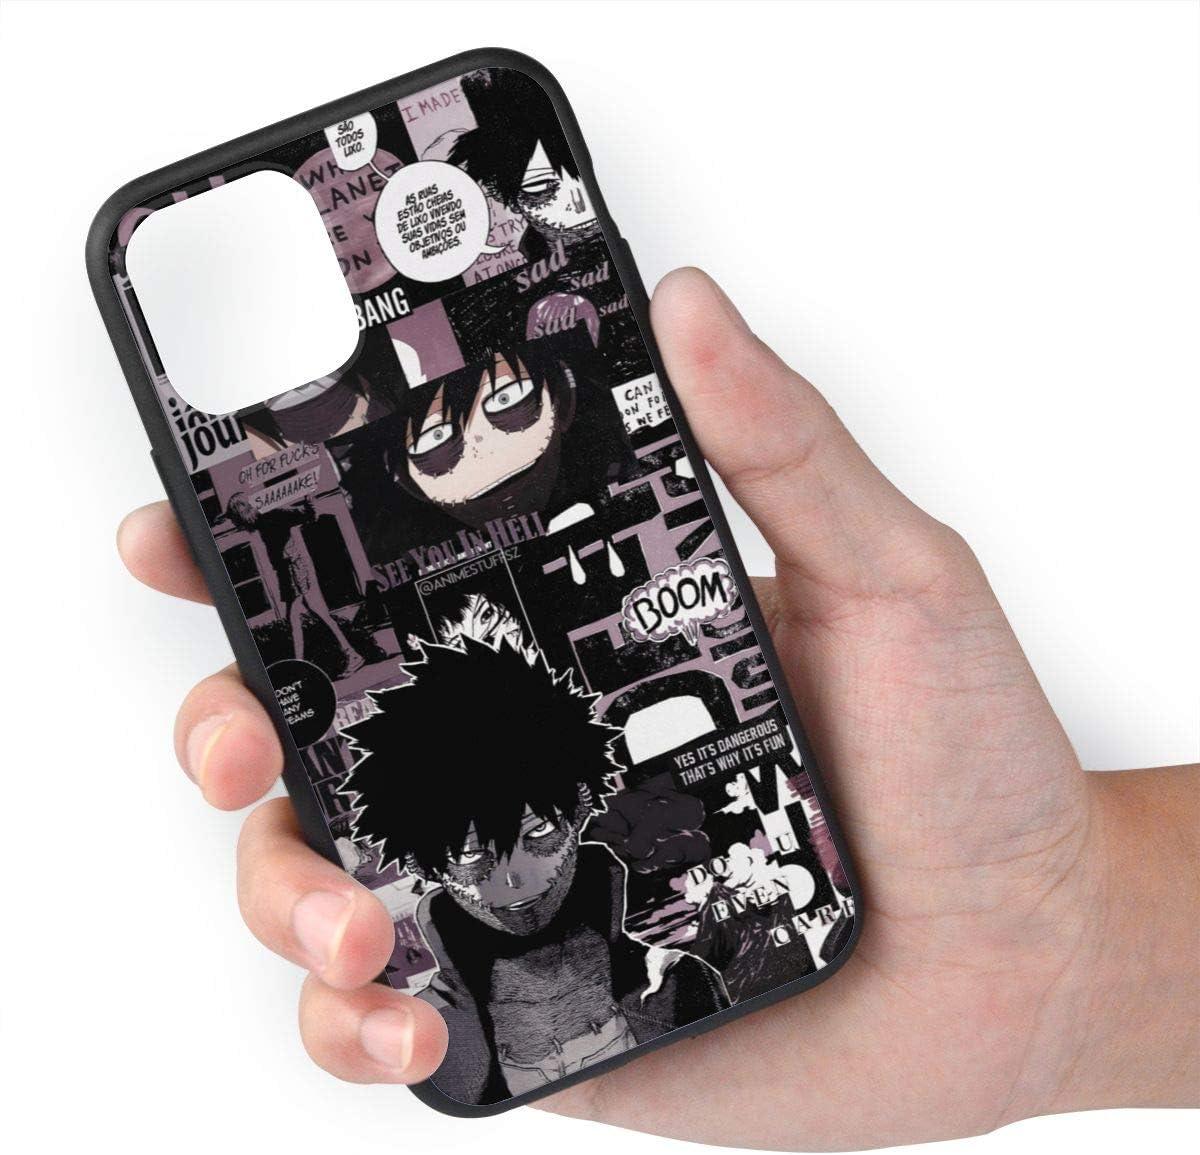 Dabi Boku No Hero Academia Manga Phone Case Transparent Soft For iPhone 12 Pro Max 11 X Xs Xr Max My Hero Academia iPhone Case